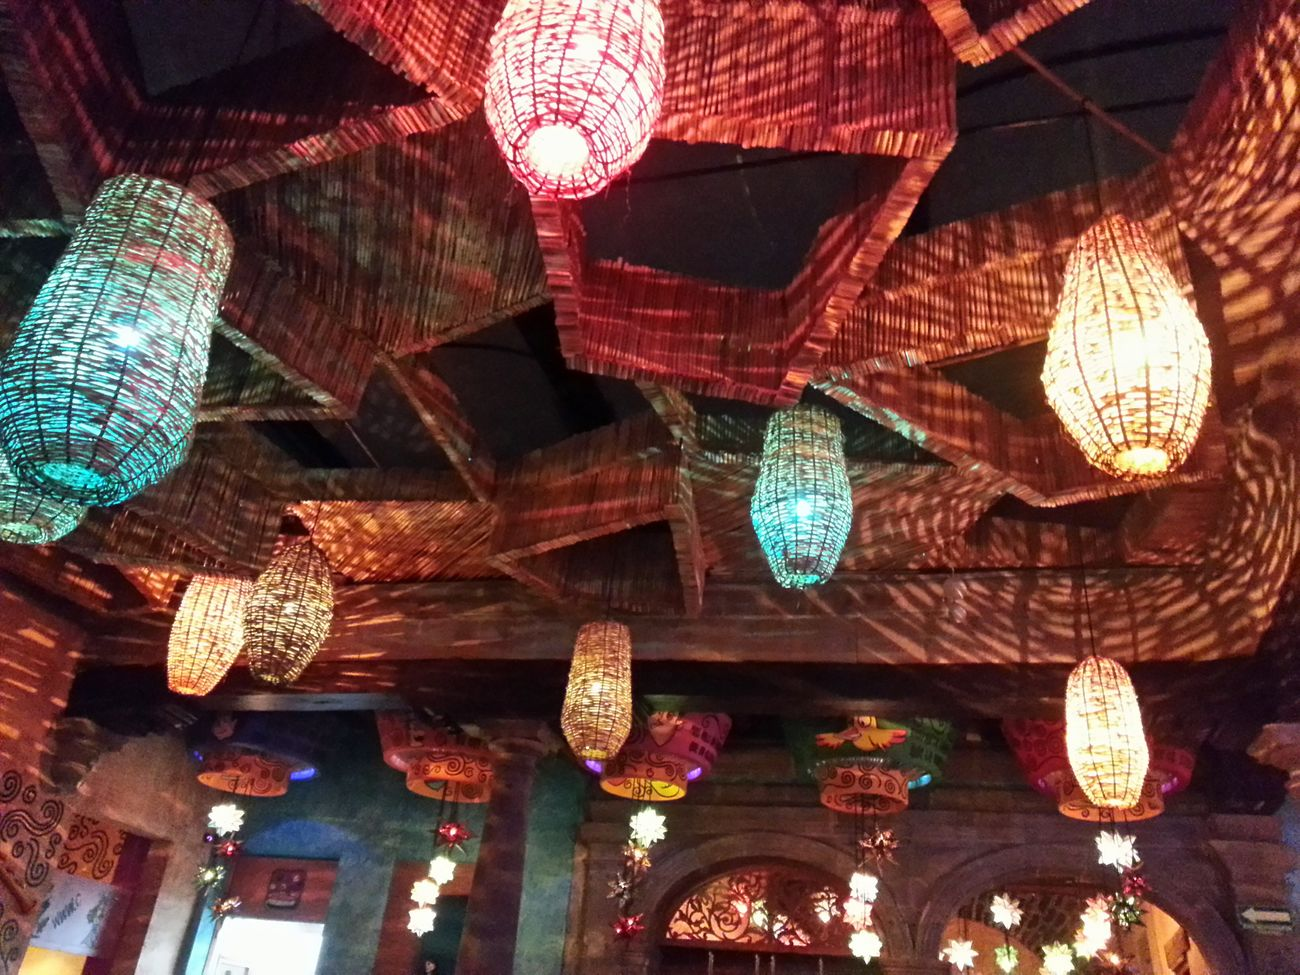 Formas y luces de una noche treintañera. Last Drink, I Promise Centrohistorico Lights Mojito